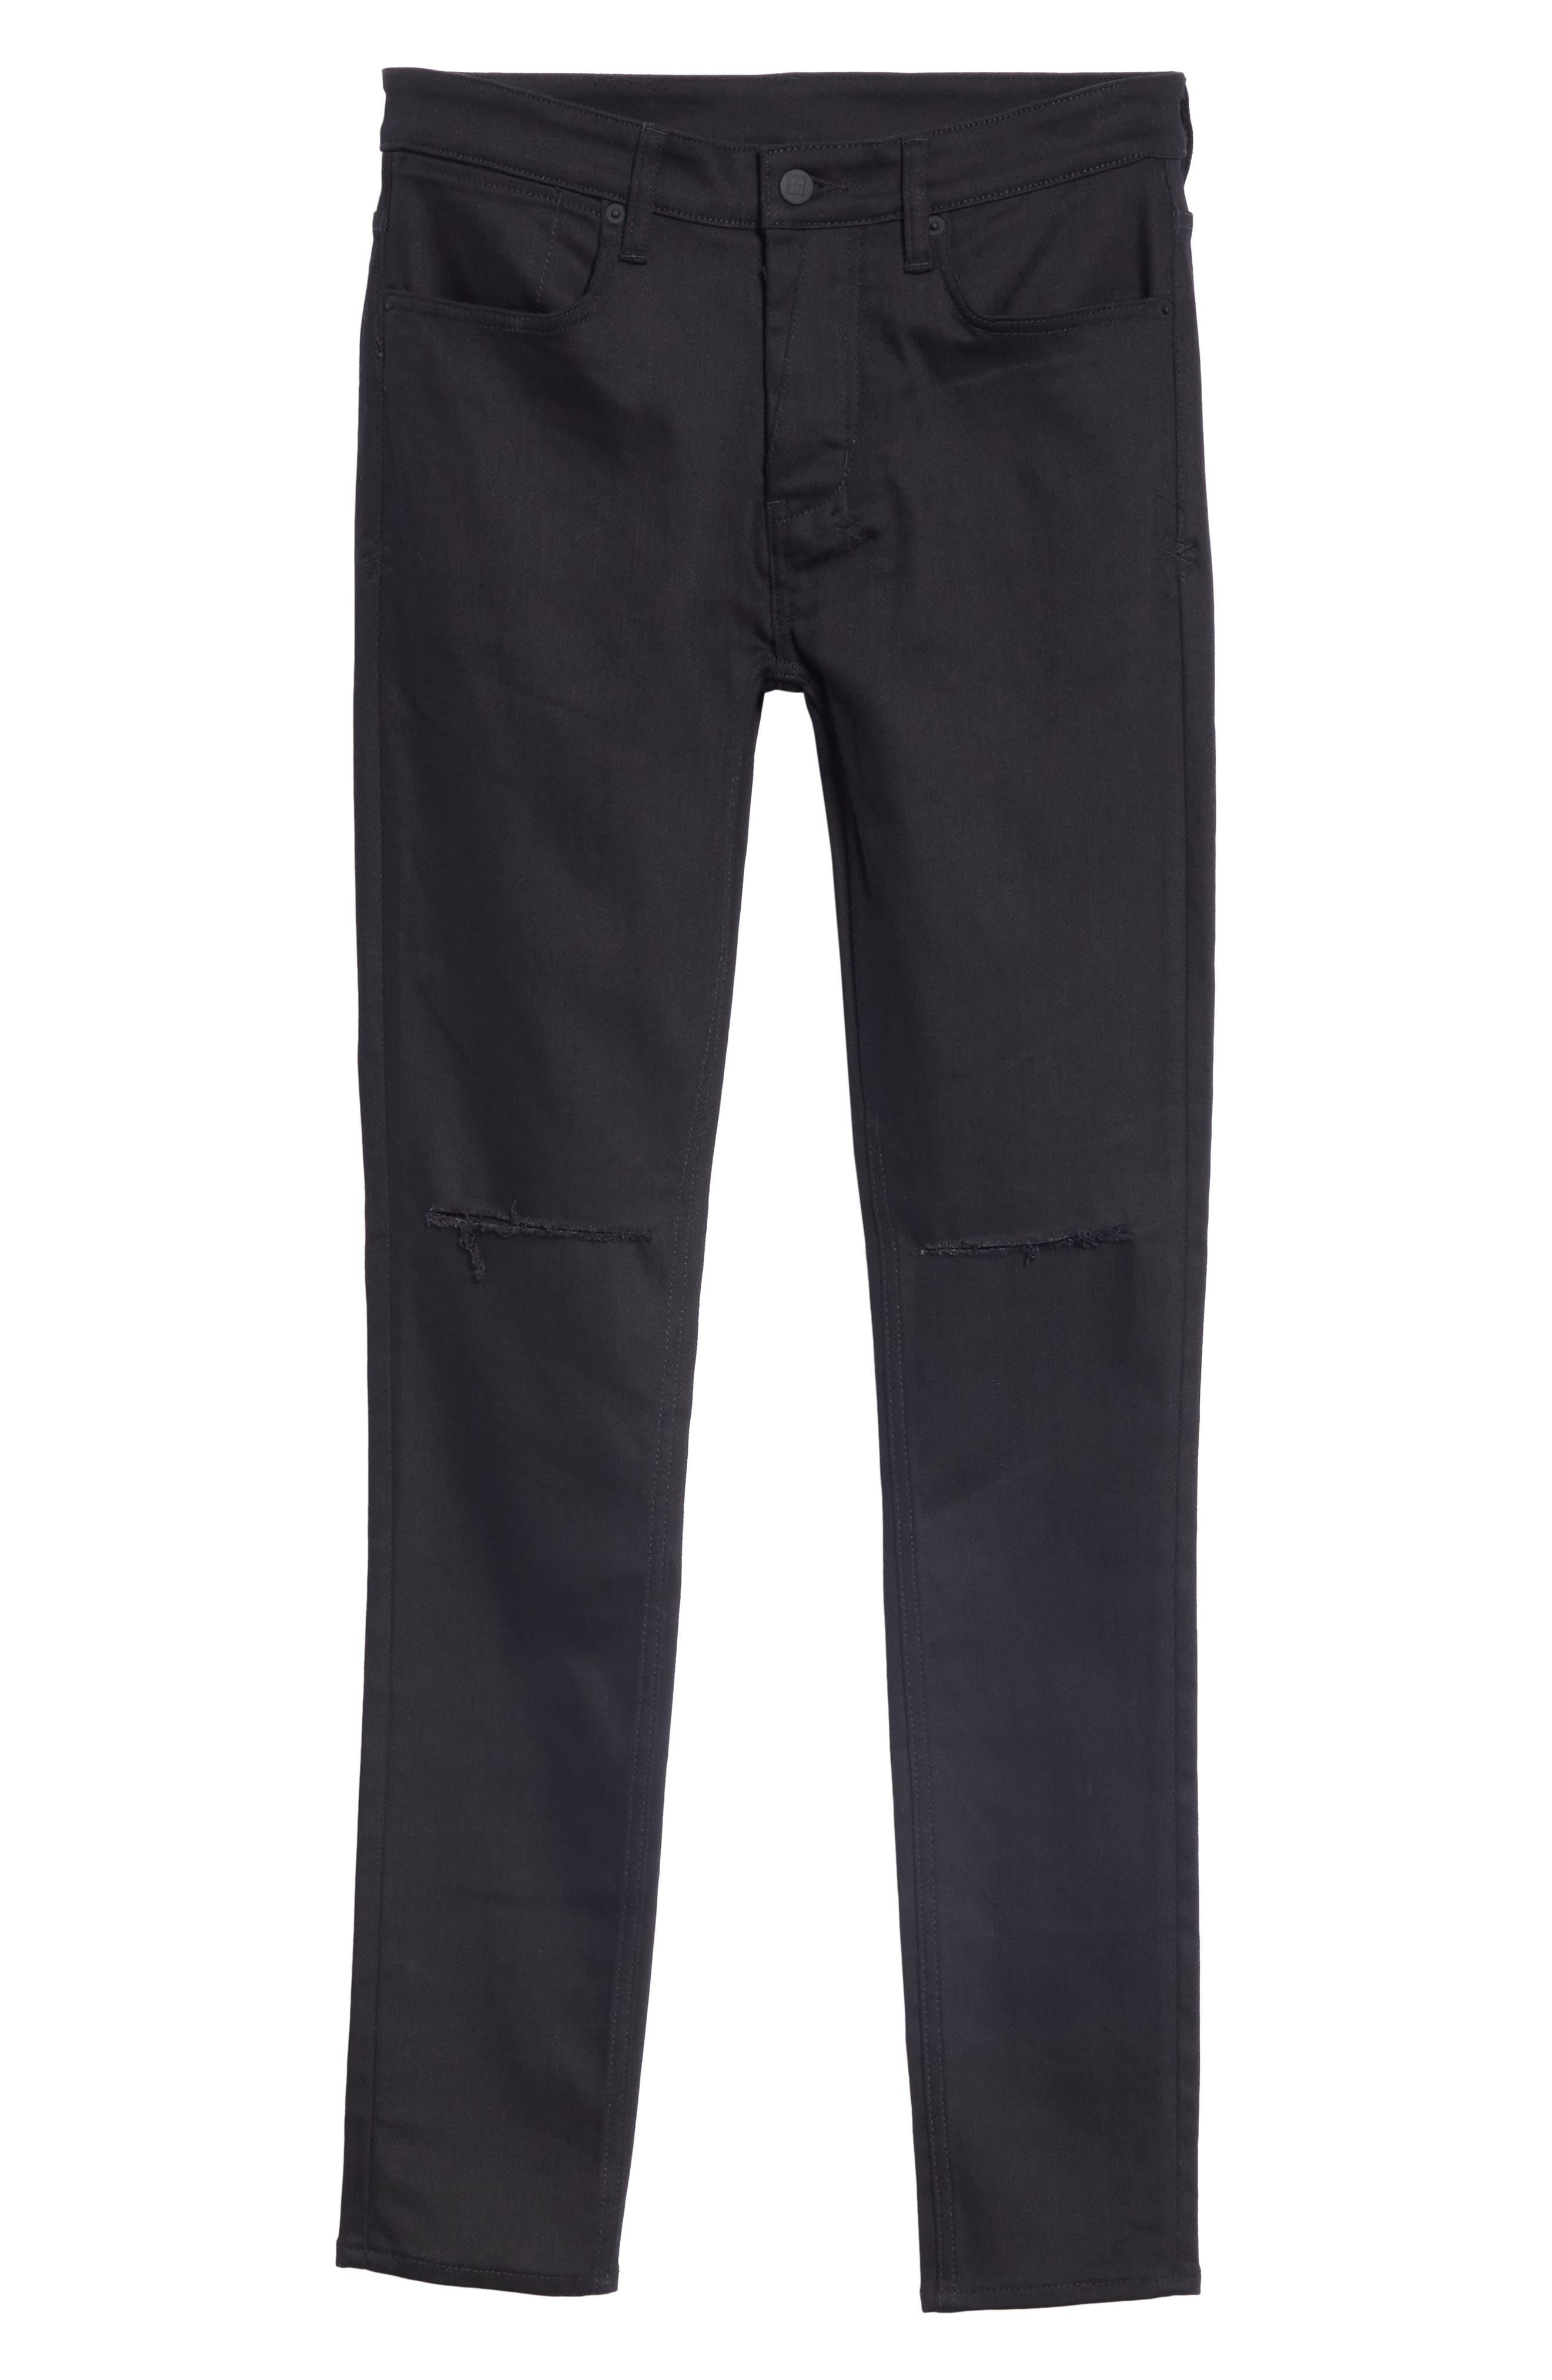 KSUBI, Van Winkle Ace Slice Jeans, Alternate thumbnail 6, color, BLACK